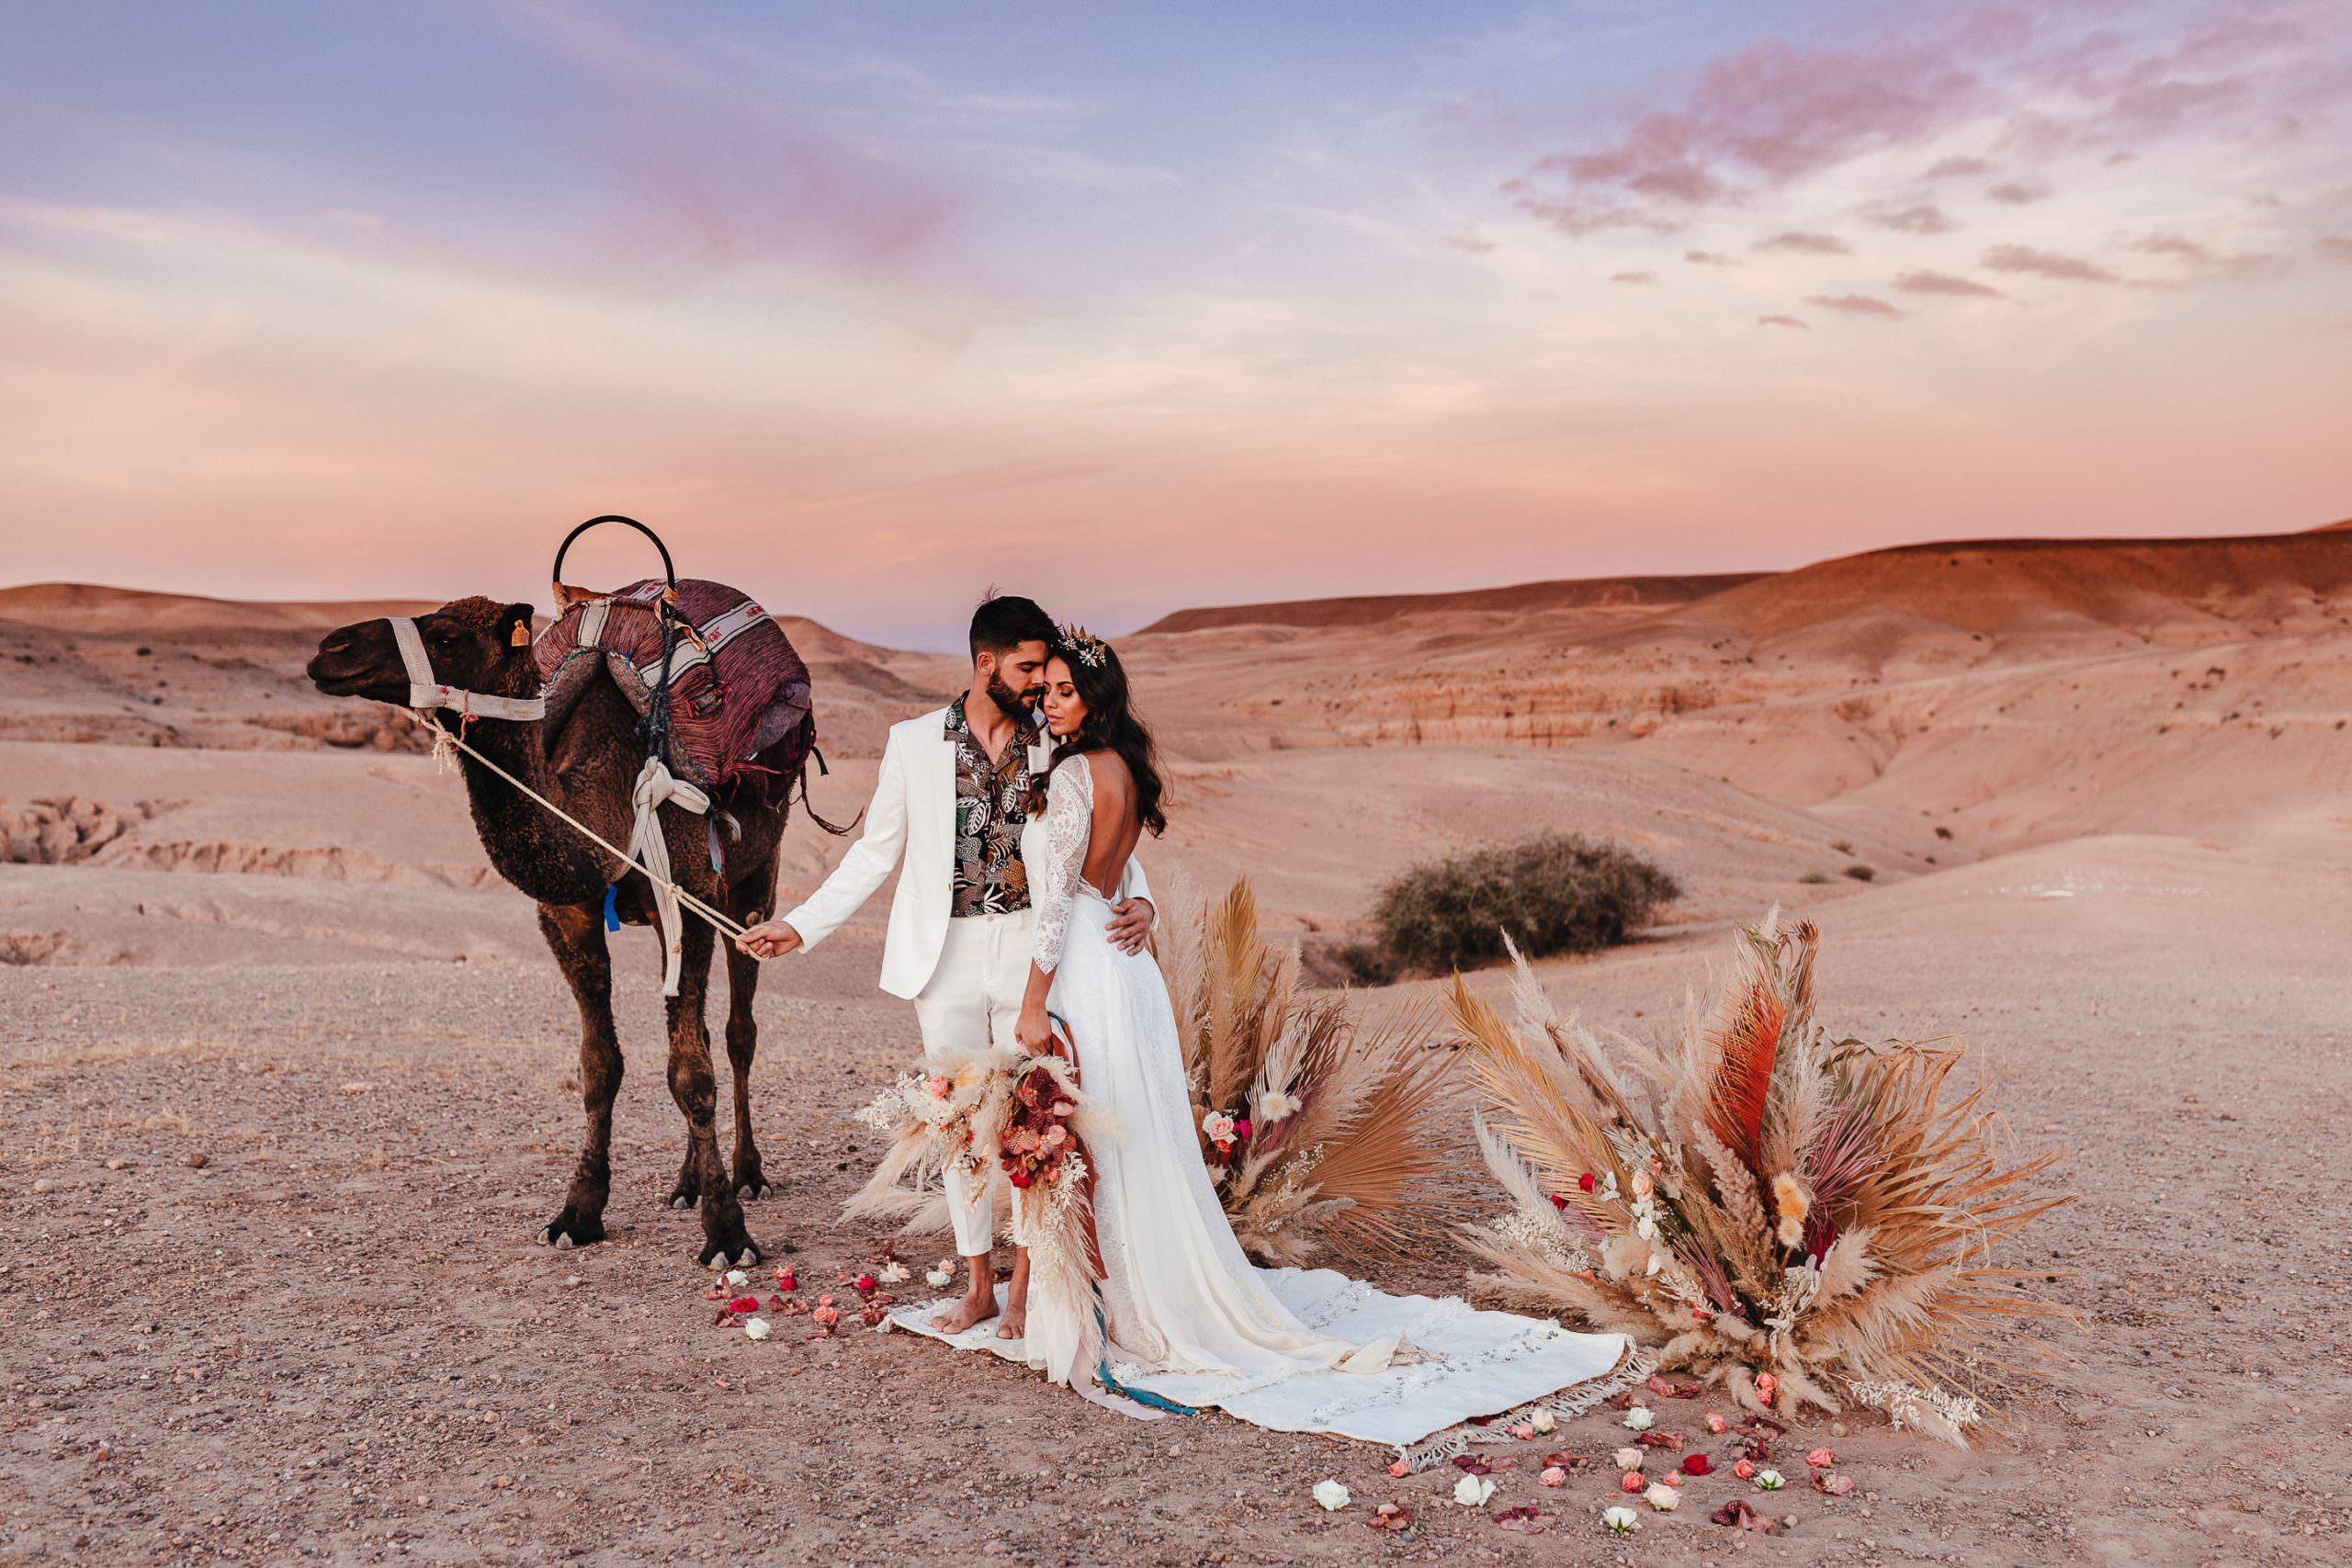 festival wedding photographer surrey